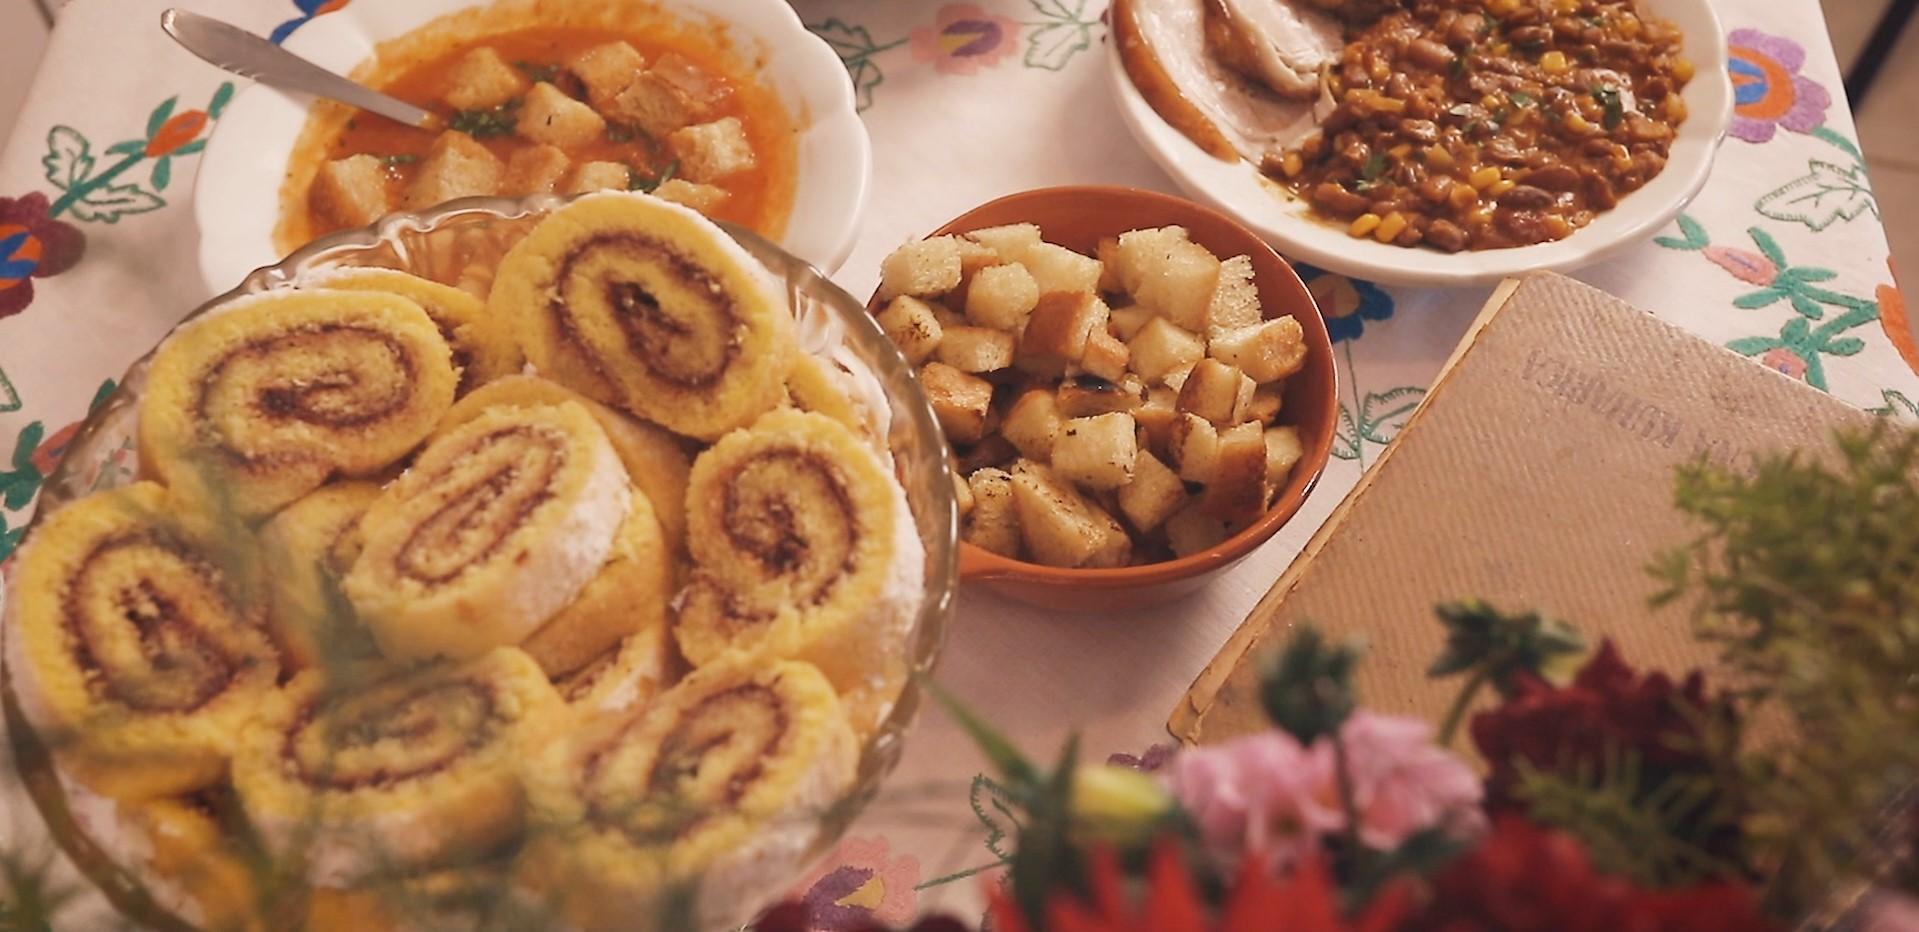 Carsko meso iz pećnice, zapečeni grah, juha od rajčice i rolada od pekmeza